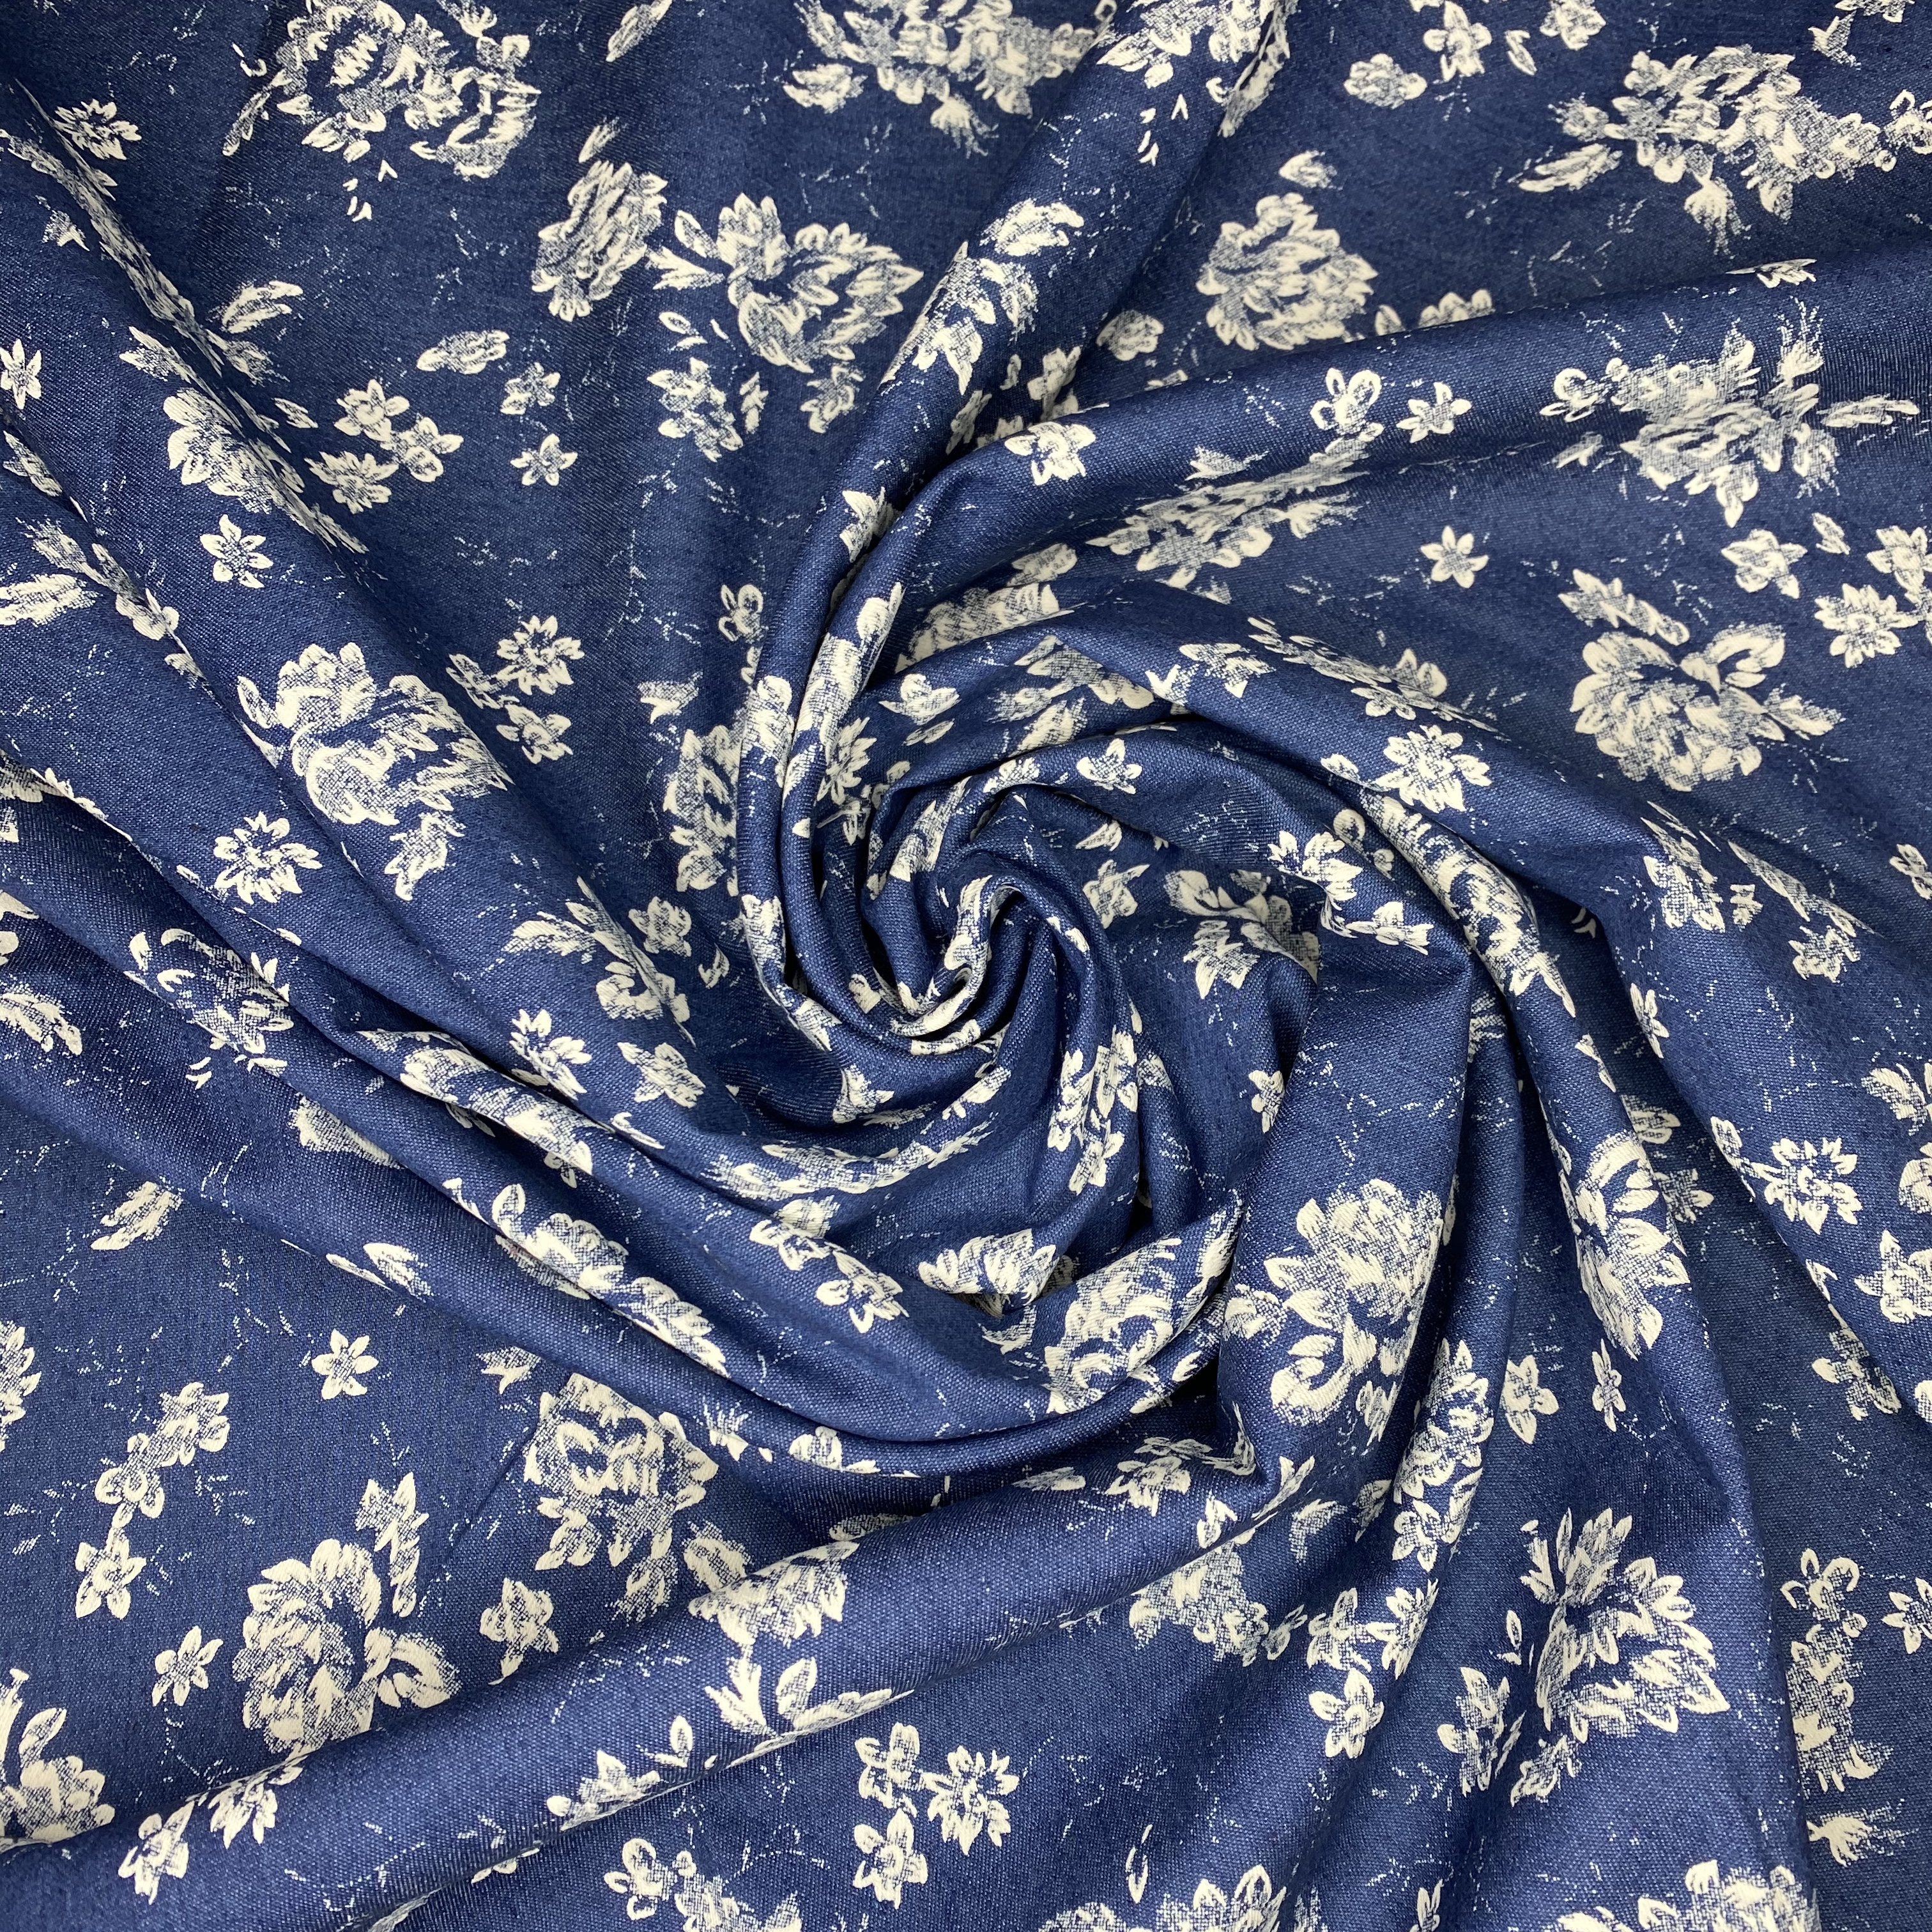 517_Blue denim flowers